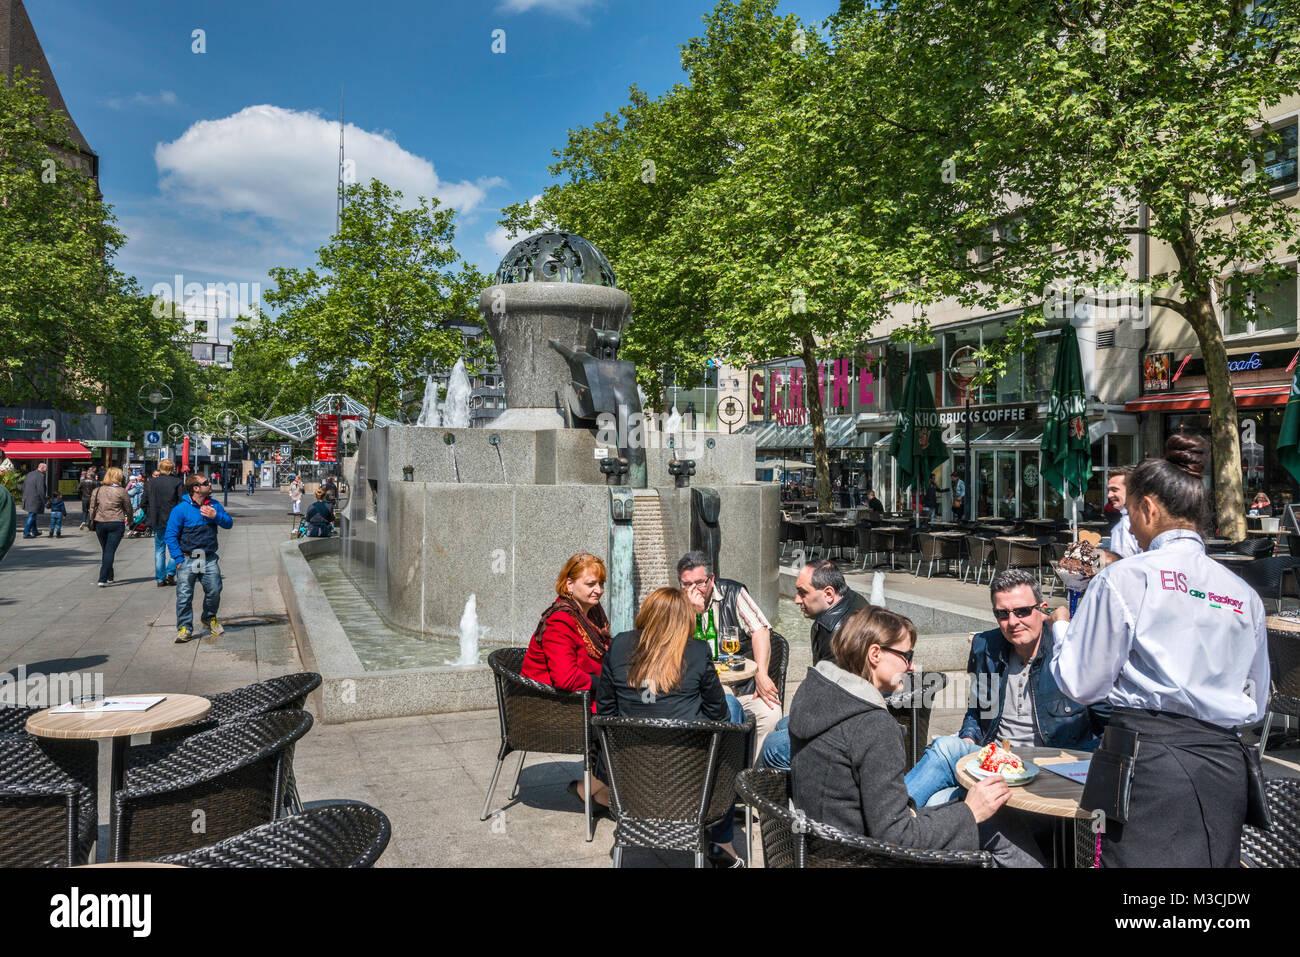 Sidewalk cafe, fountain at Kleppingstrasse, Dortmund, Ruhr area, North Rhine-Westphalia, Germany - Stock Image